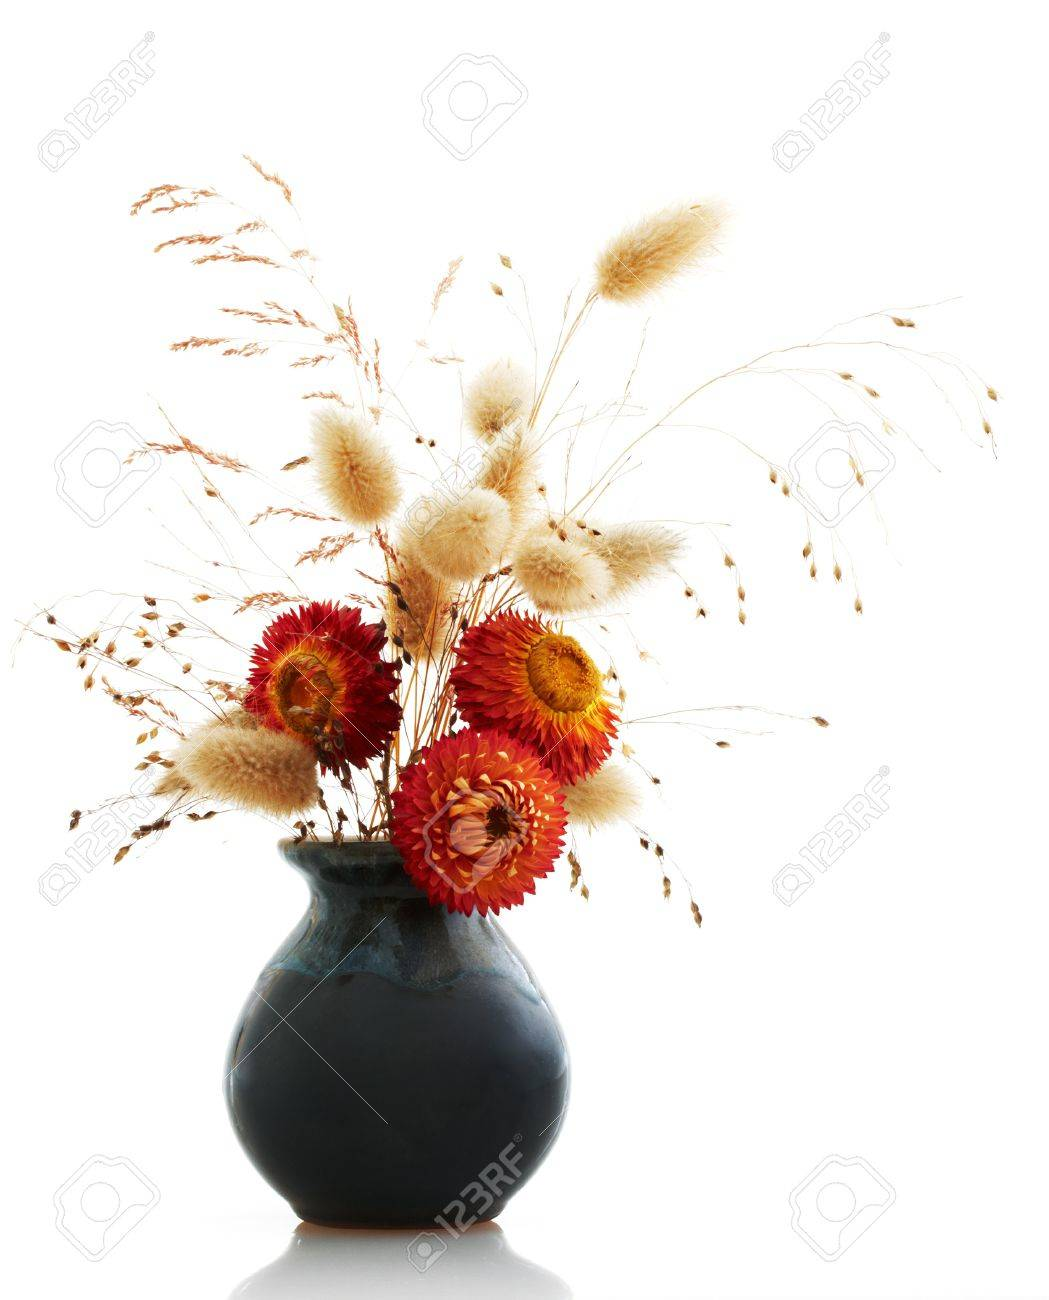 ikebana on white background Stock Photo - 10813178